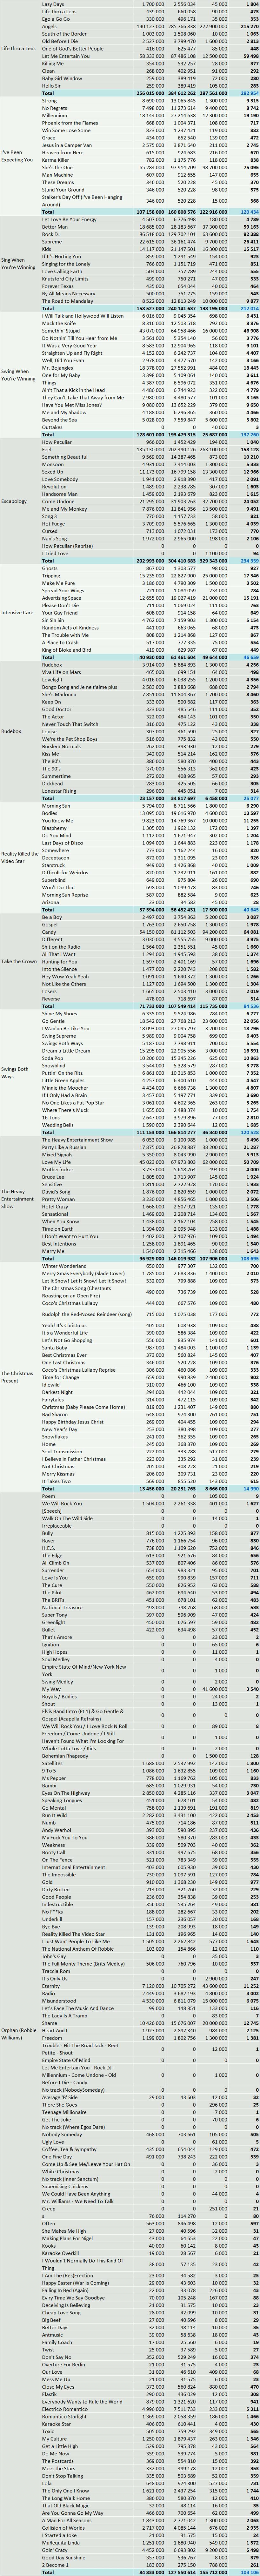 CSPC Robbie Williams streaming statistics Spotify YouTube